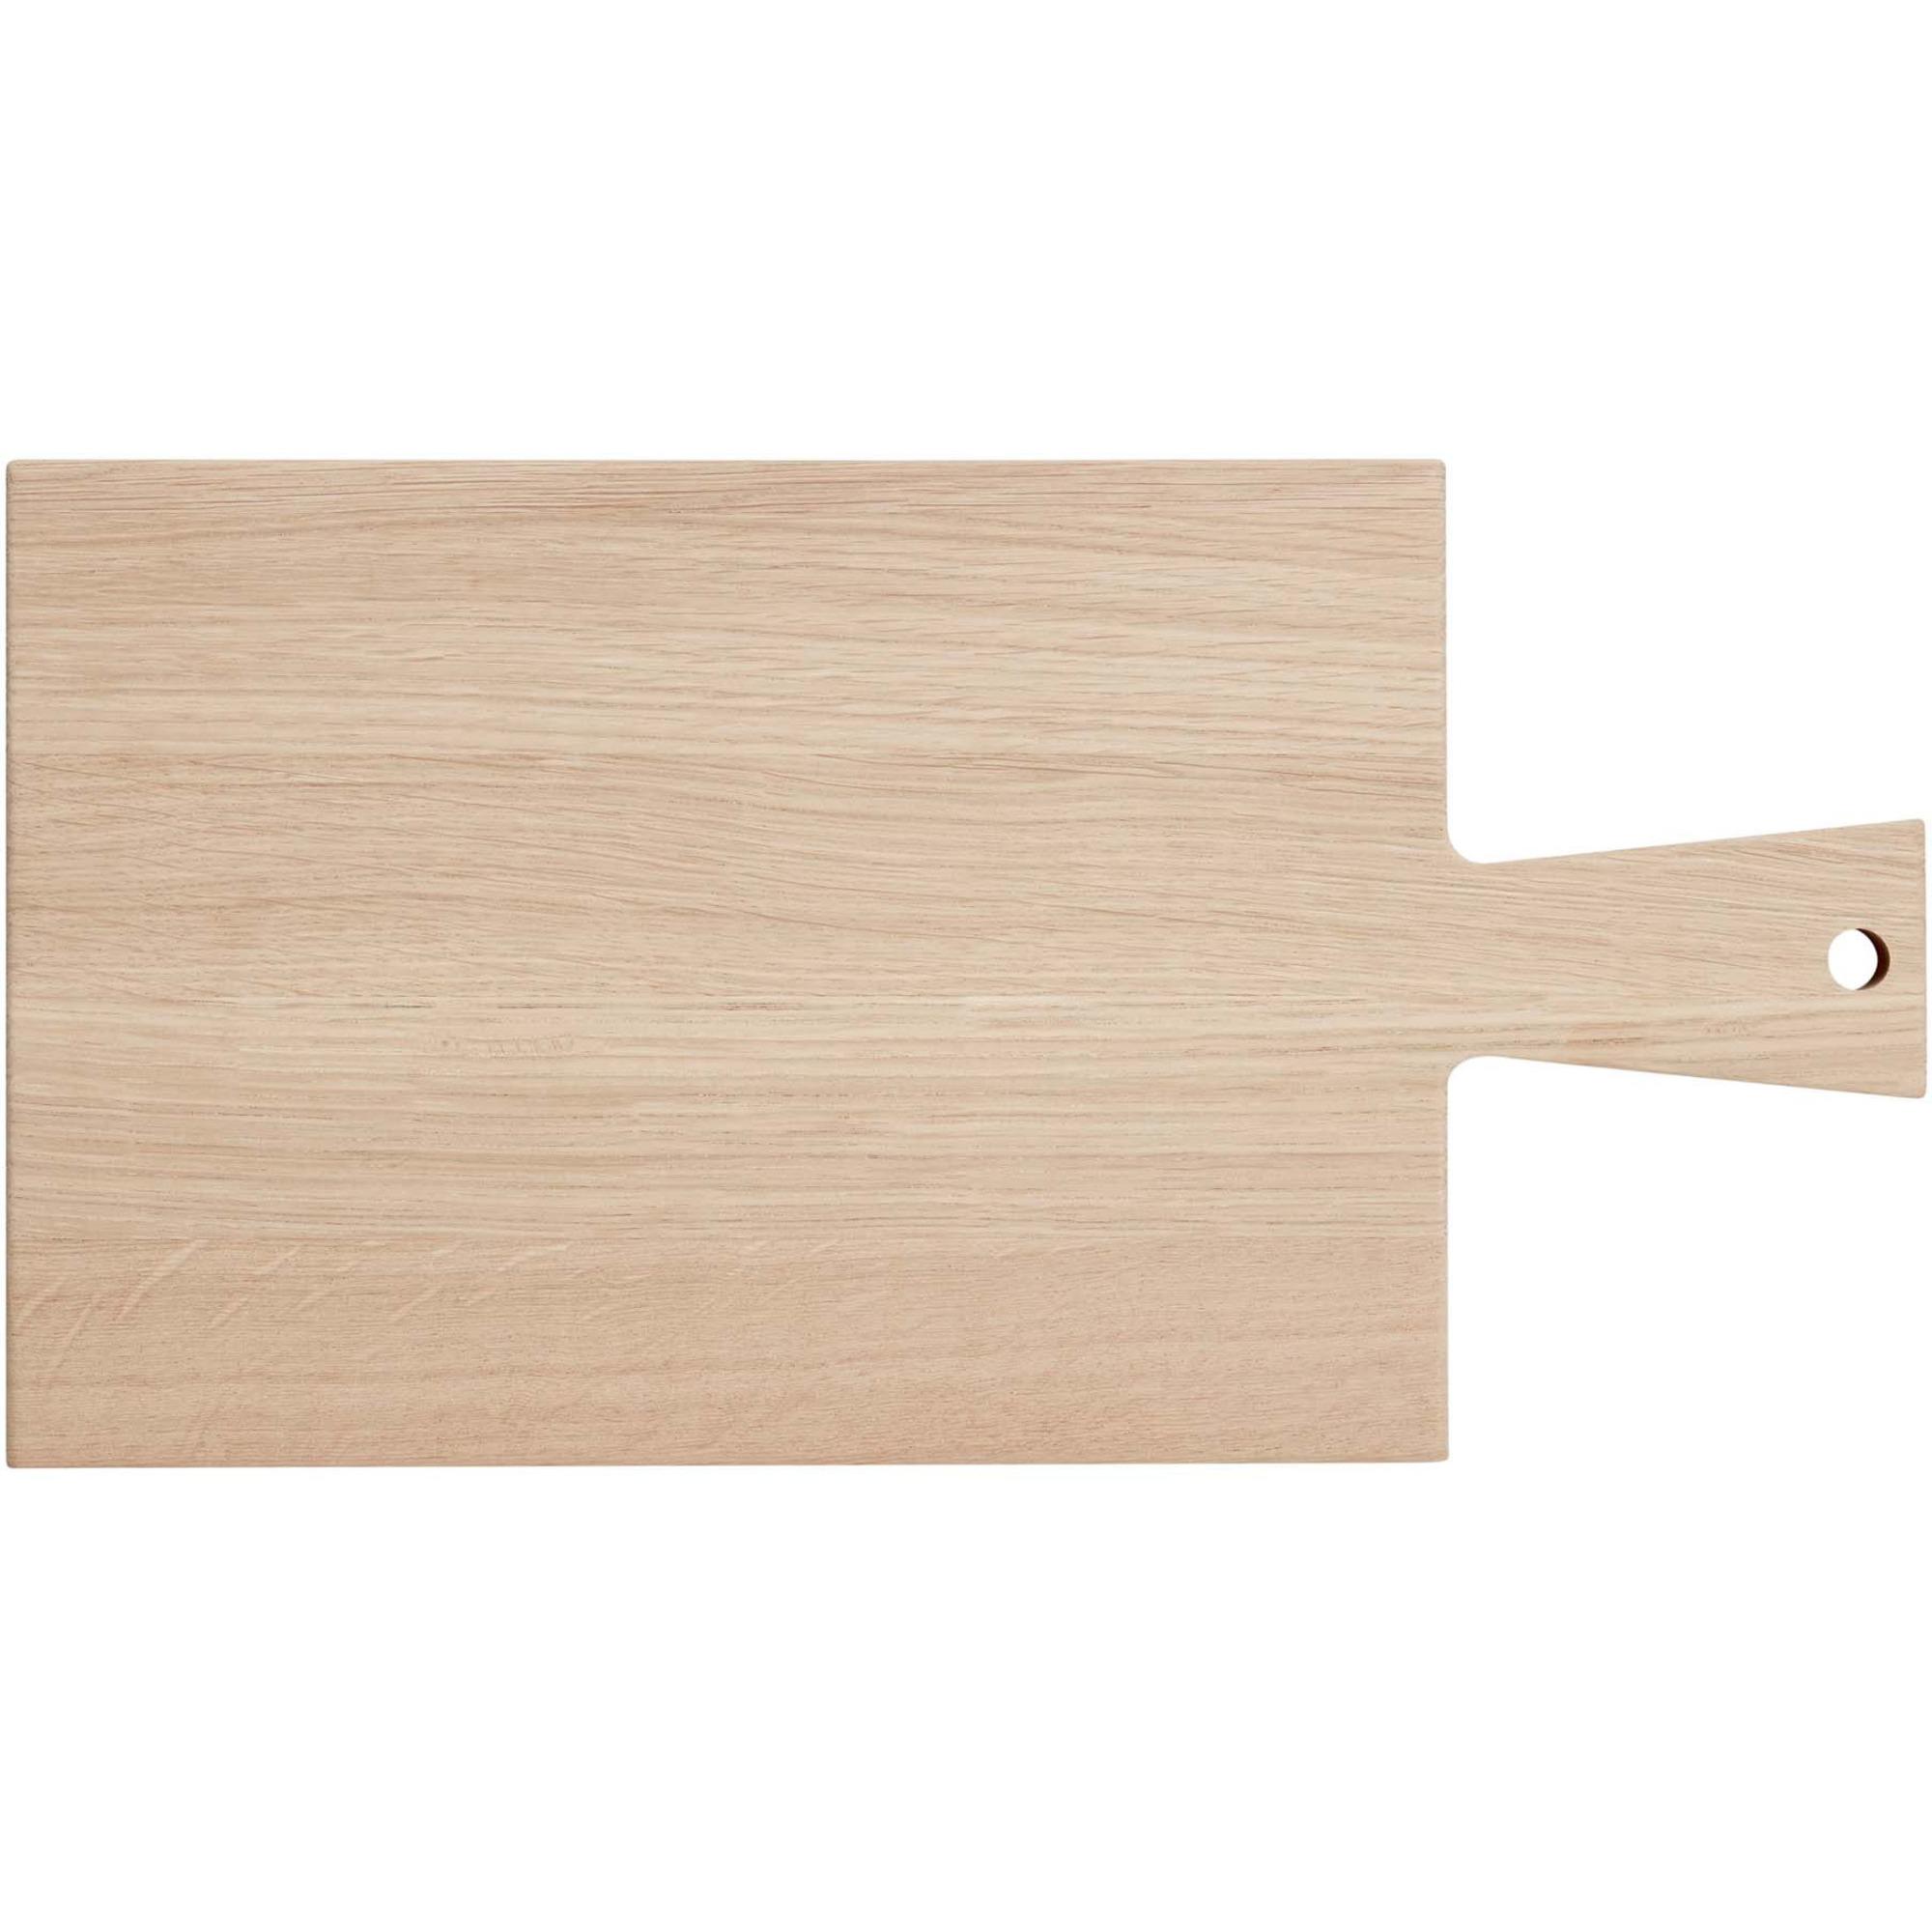 Andersen Furniture Serveringsbricka 40 x 21 cm Oak